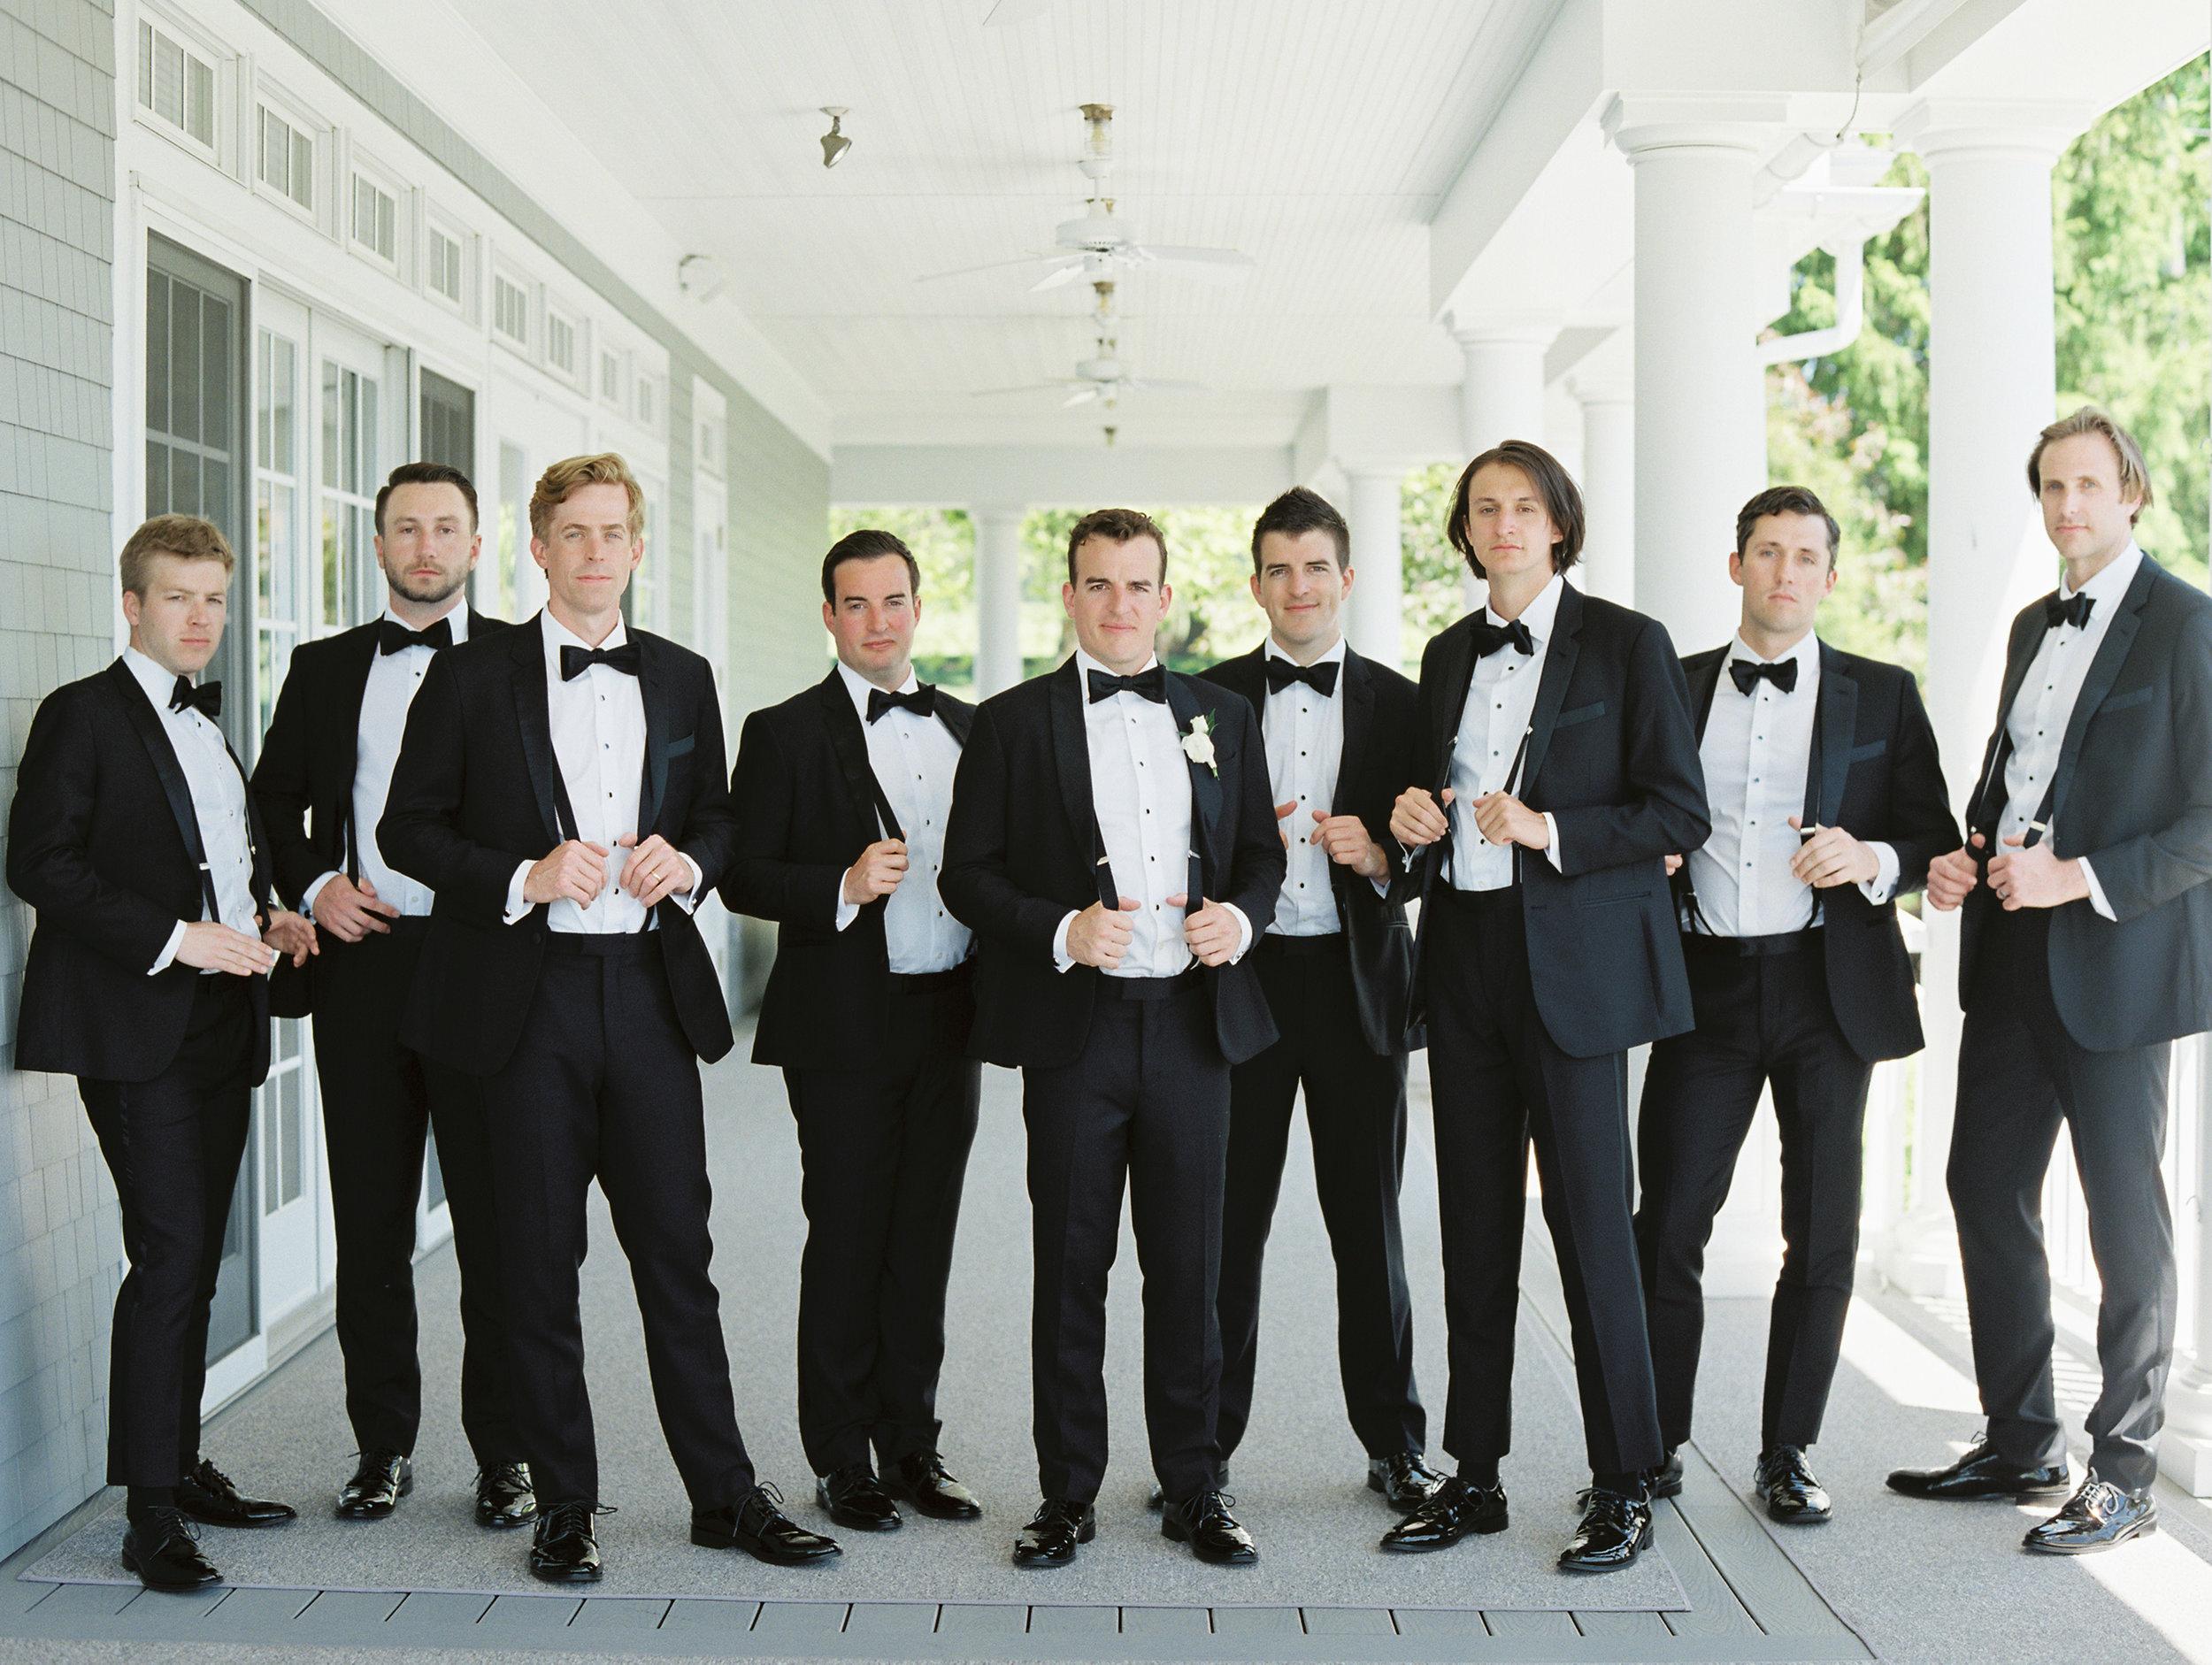 DeGuilio+Wedding+Bridal+Partyf-2.jpg